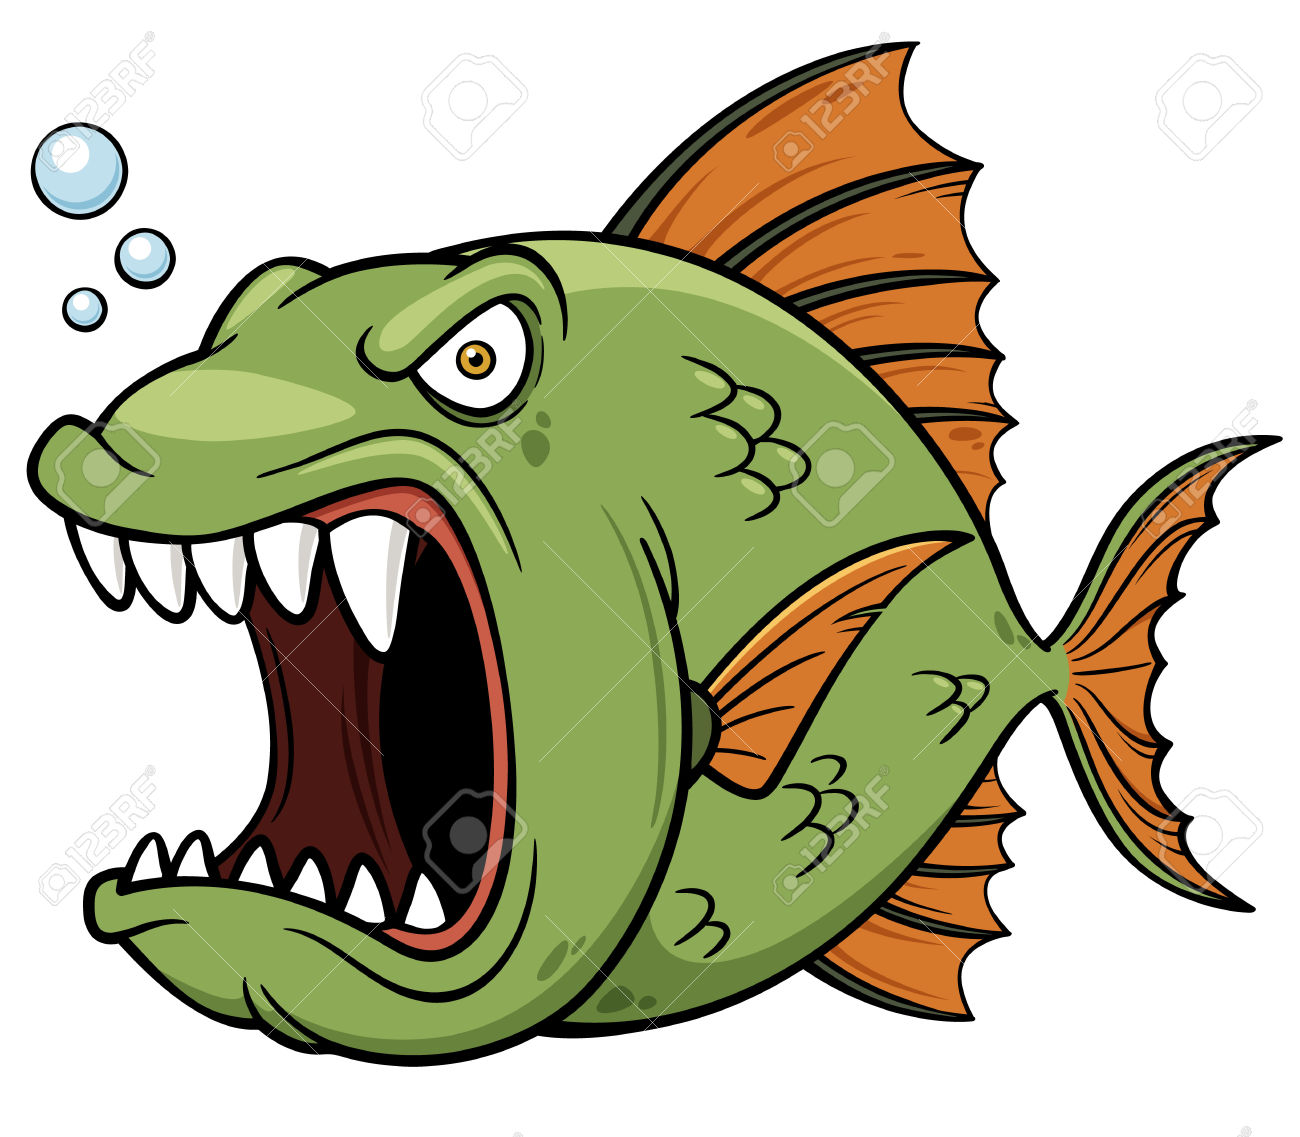 Piranha clipart #12, Download drawings